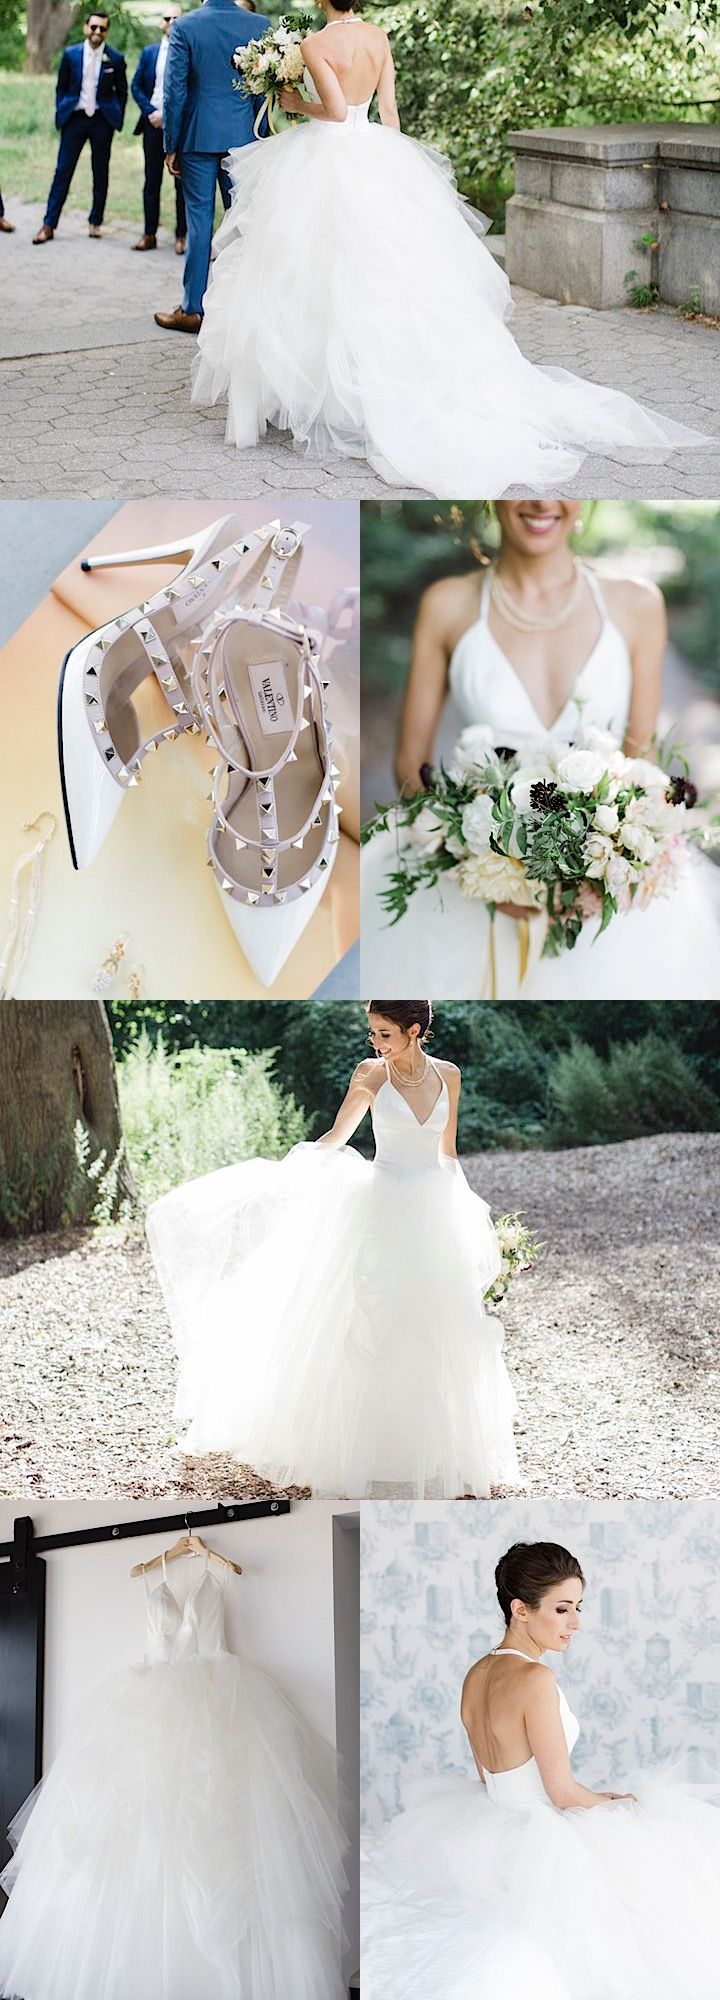 Brooklyn Wedding With A Ballerina Bride